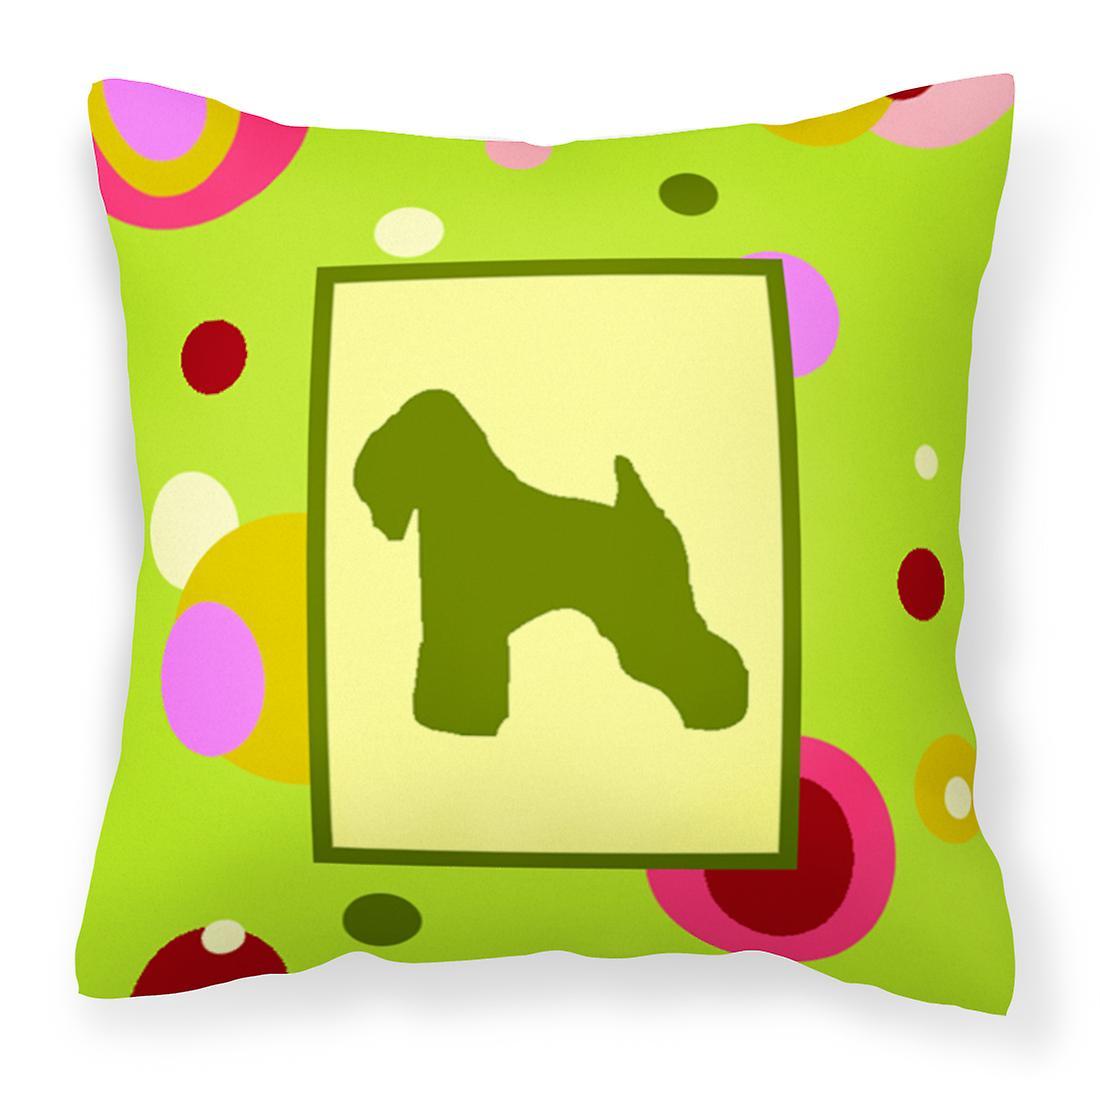 Terrier Oreiller Enduit Wheaten Soft Décoratif Toile Tissu Jc3lFKu15T